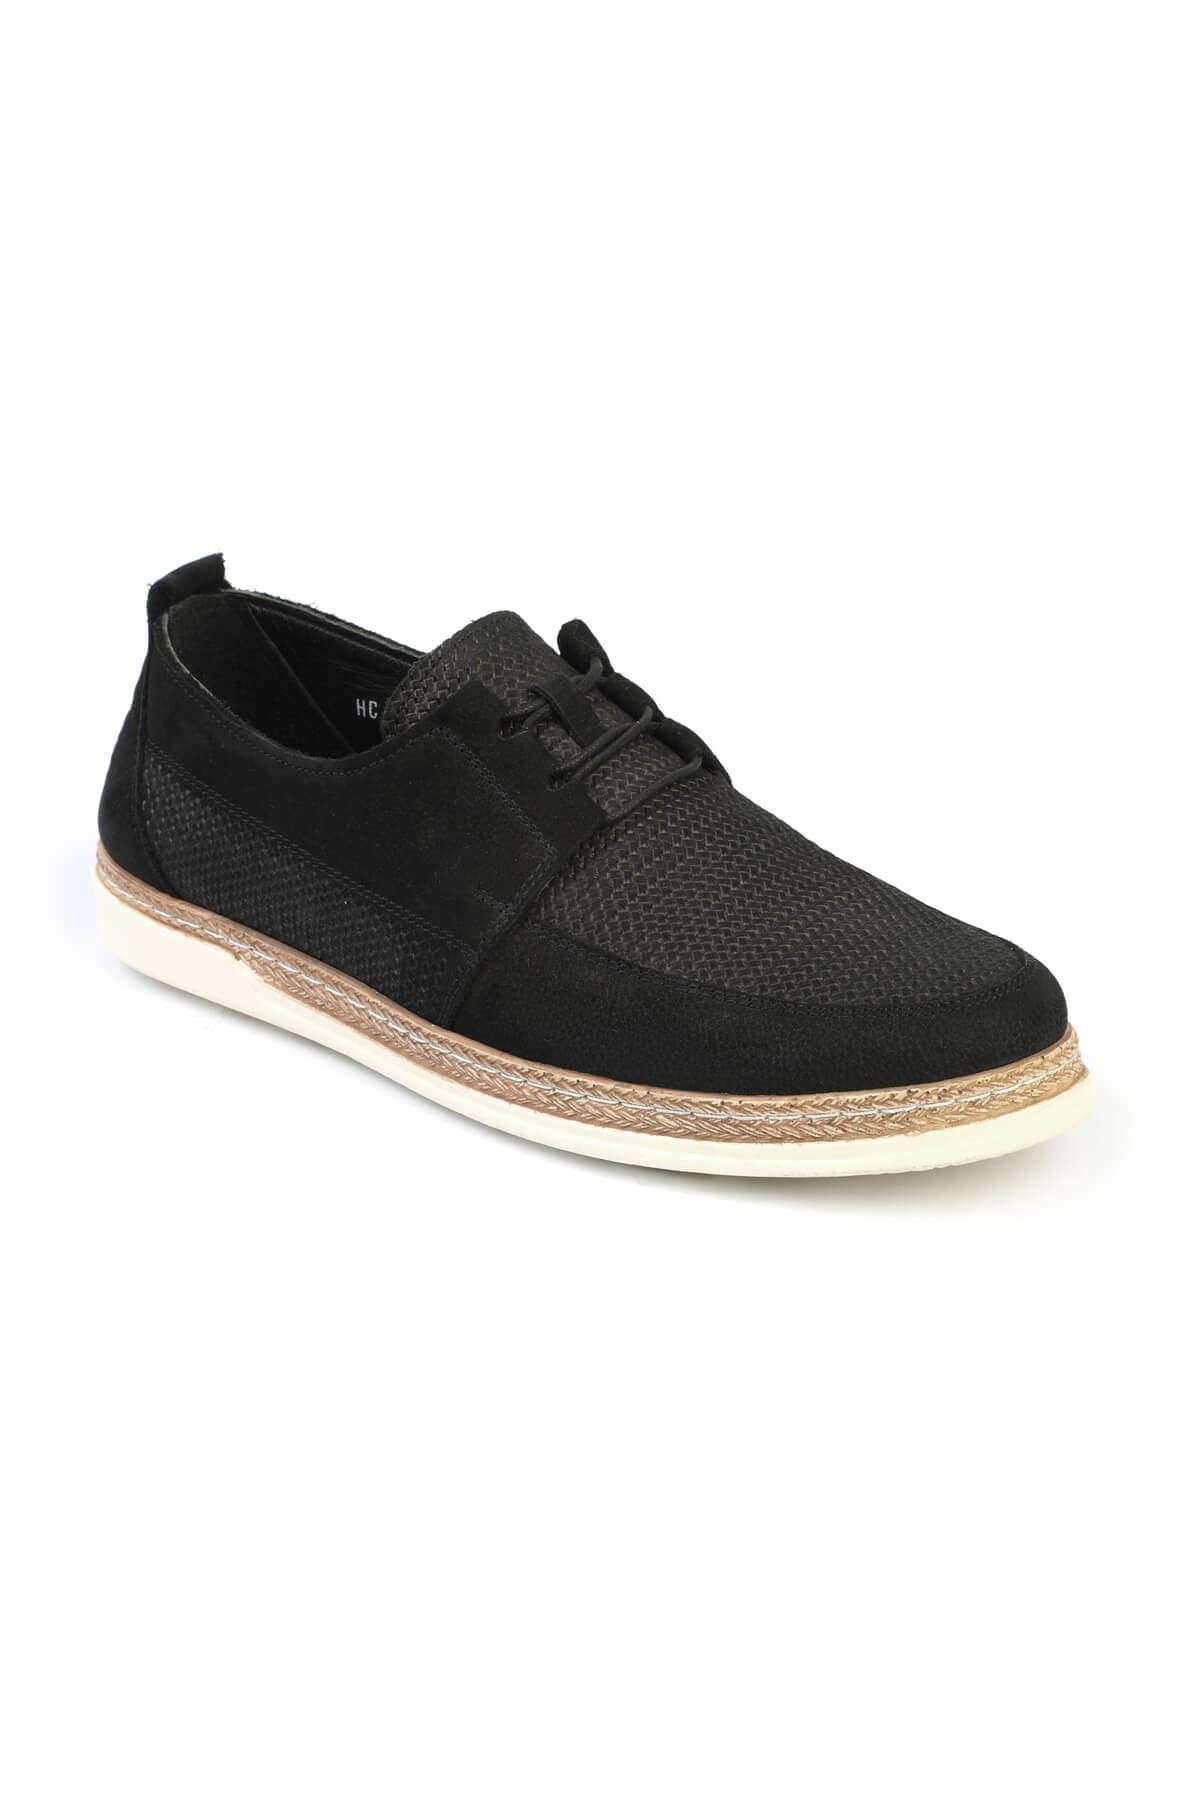 Libero C623 Black Loafer Shoes